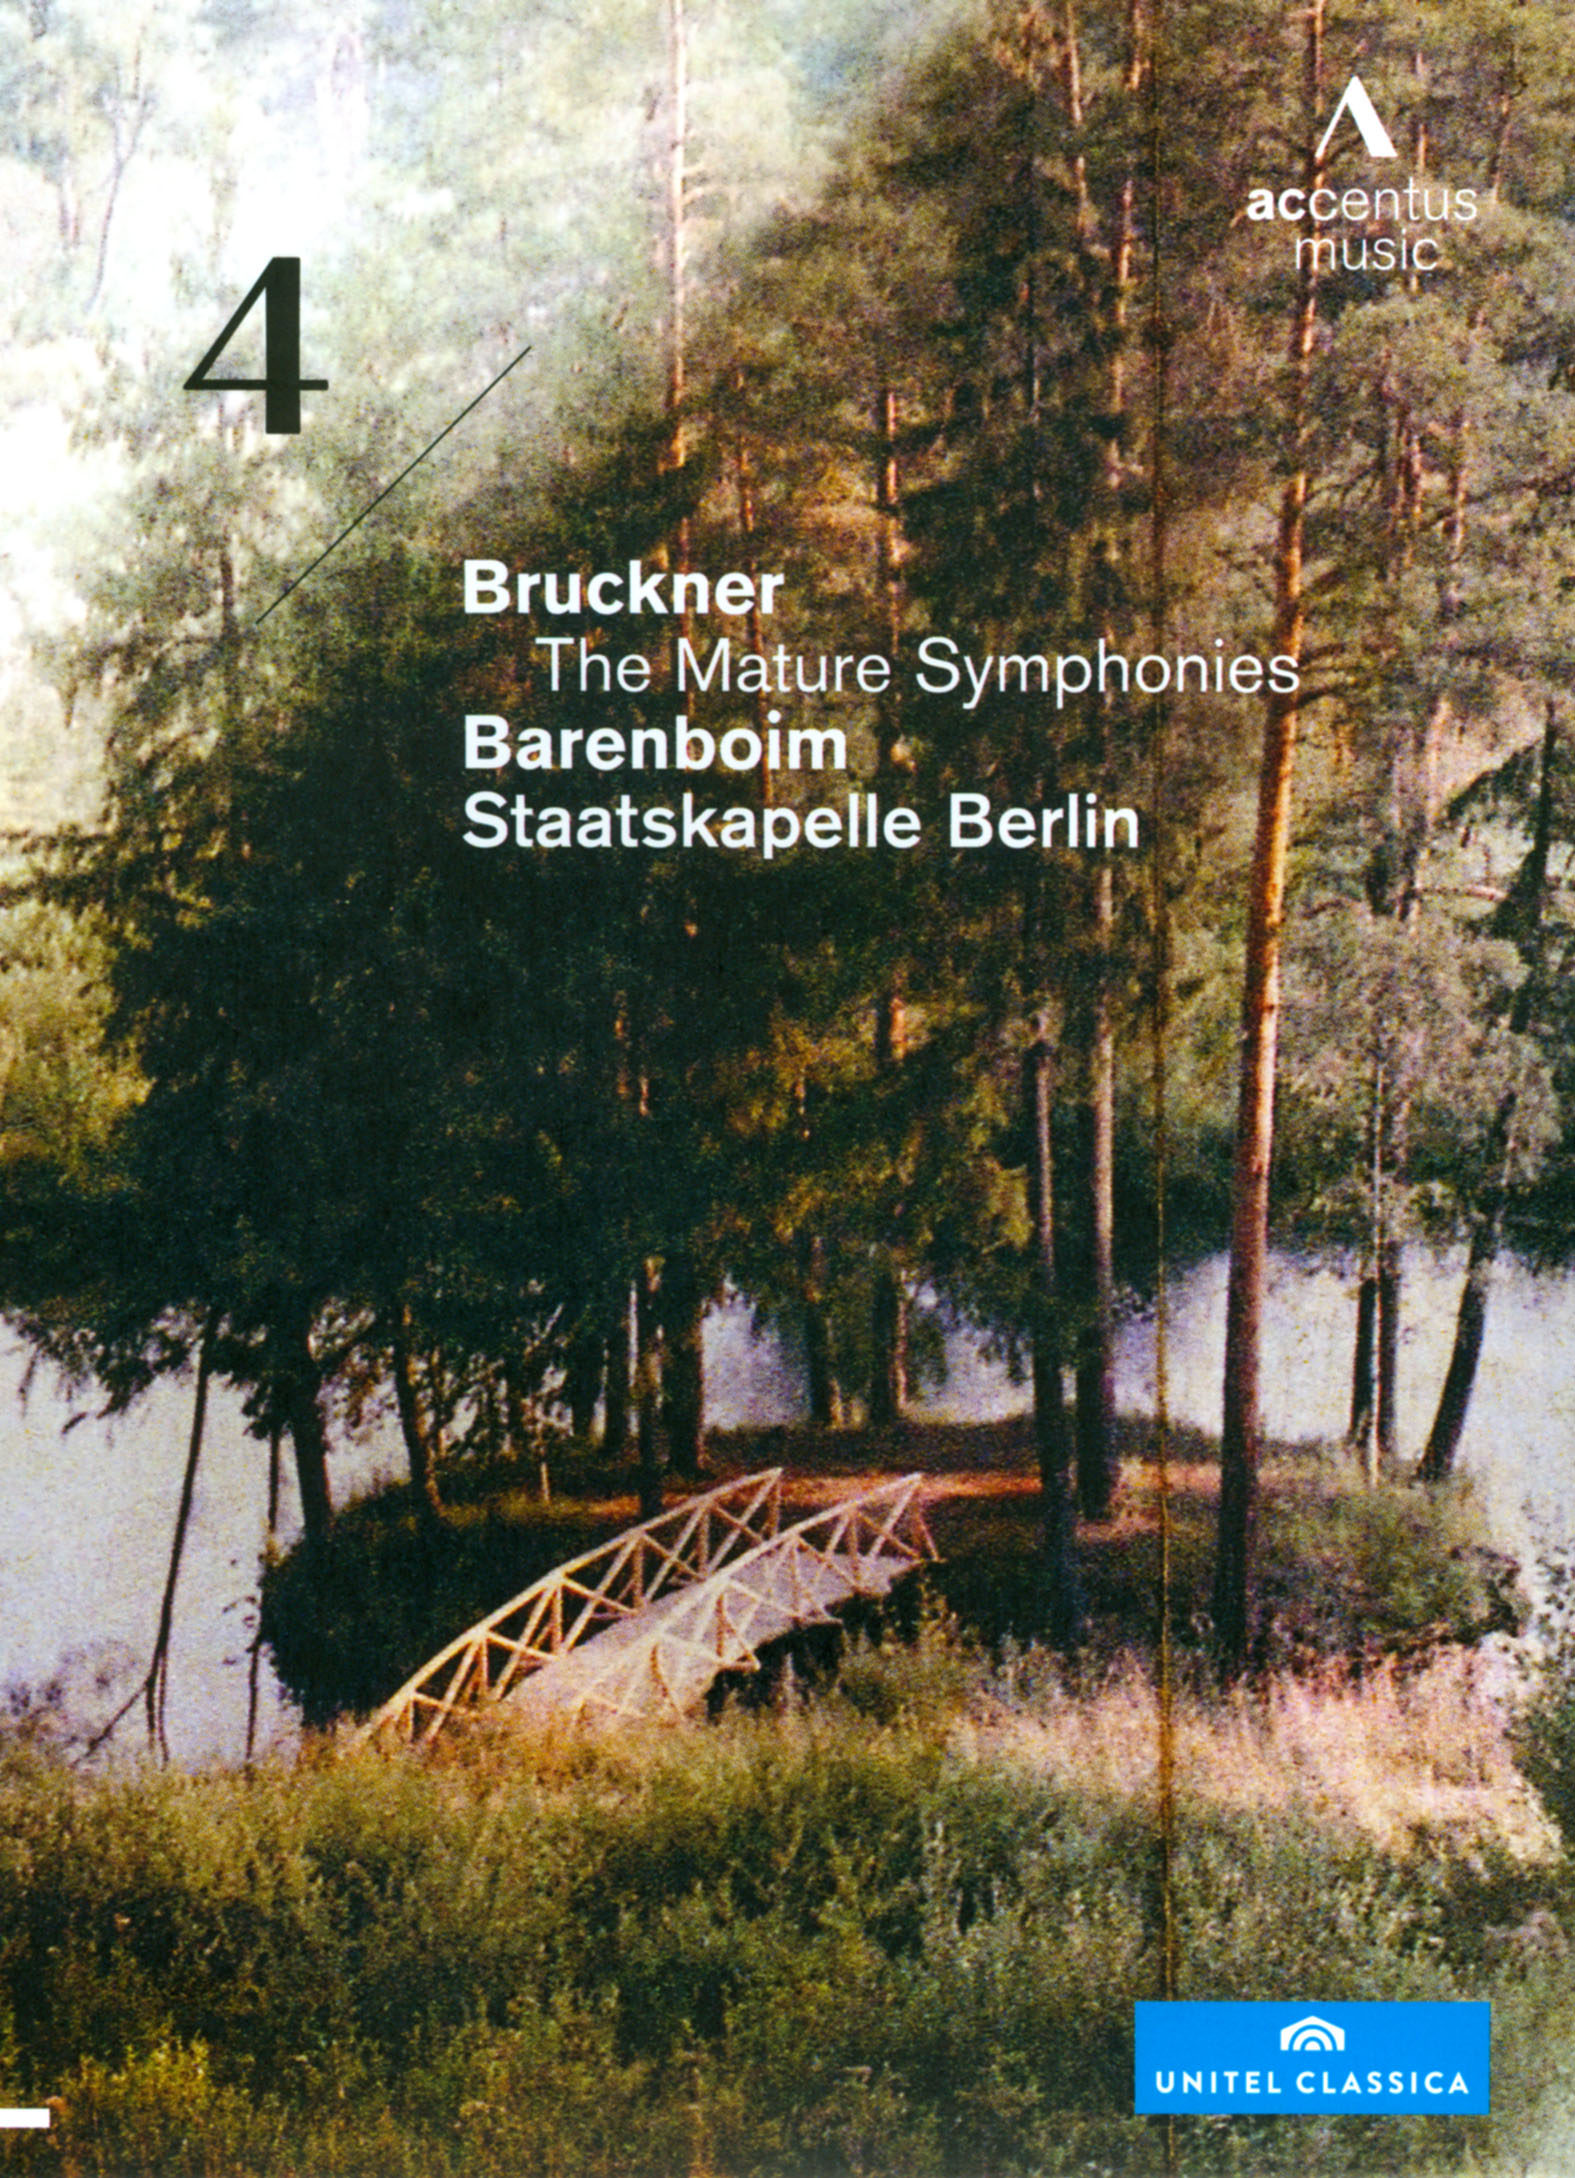 Barenboim/Staatskapelle Berlin: Bruckner - The Mature Symphonies, No. 4